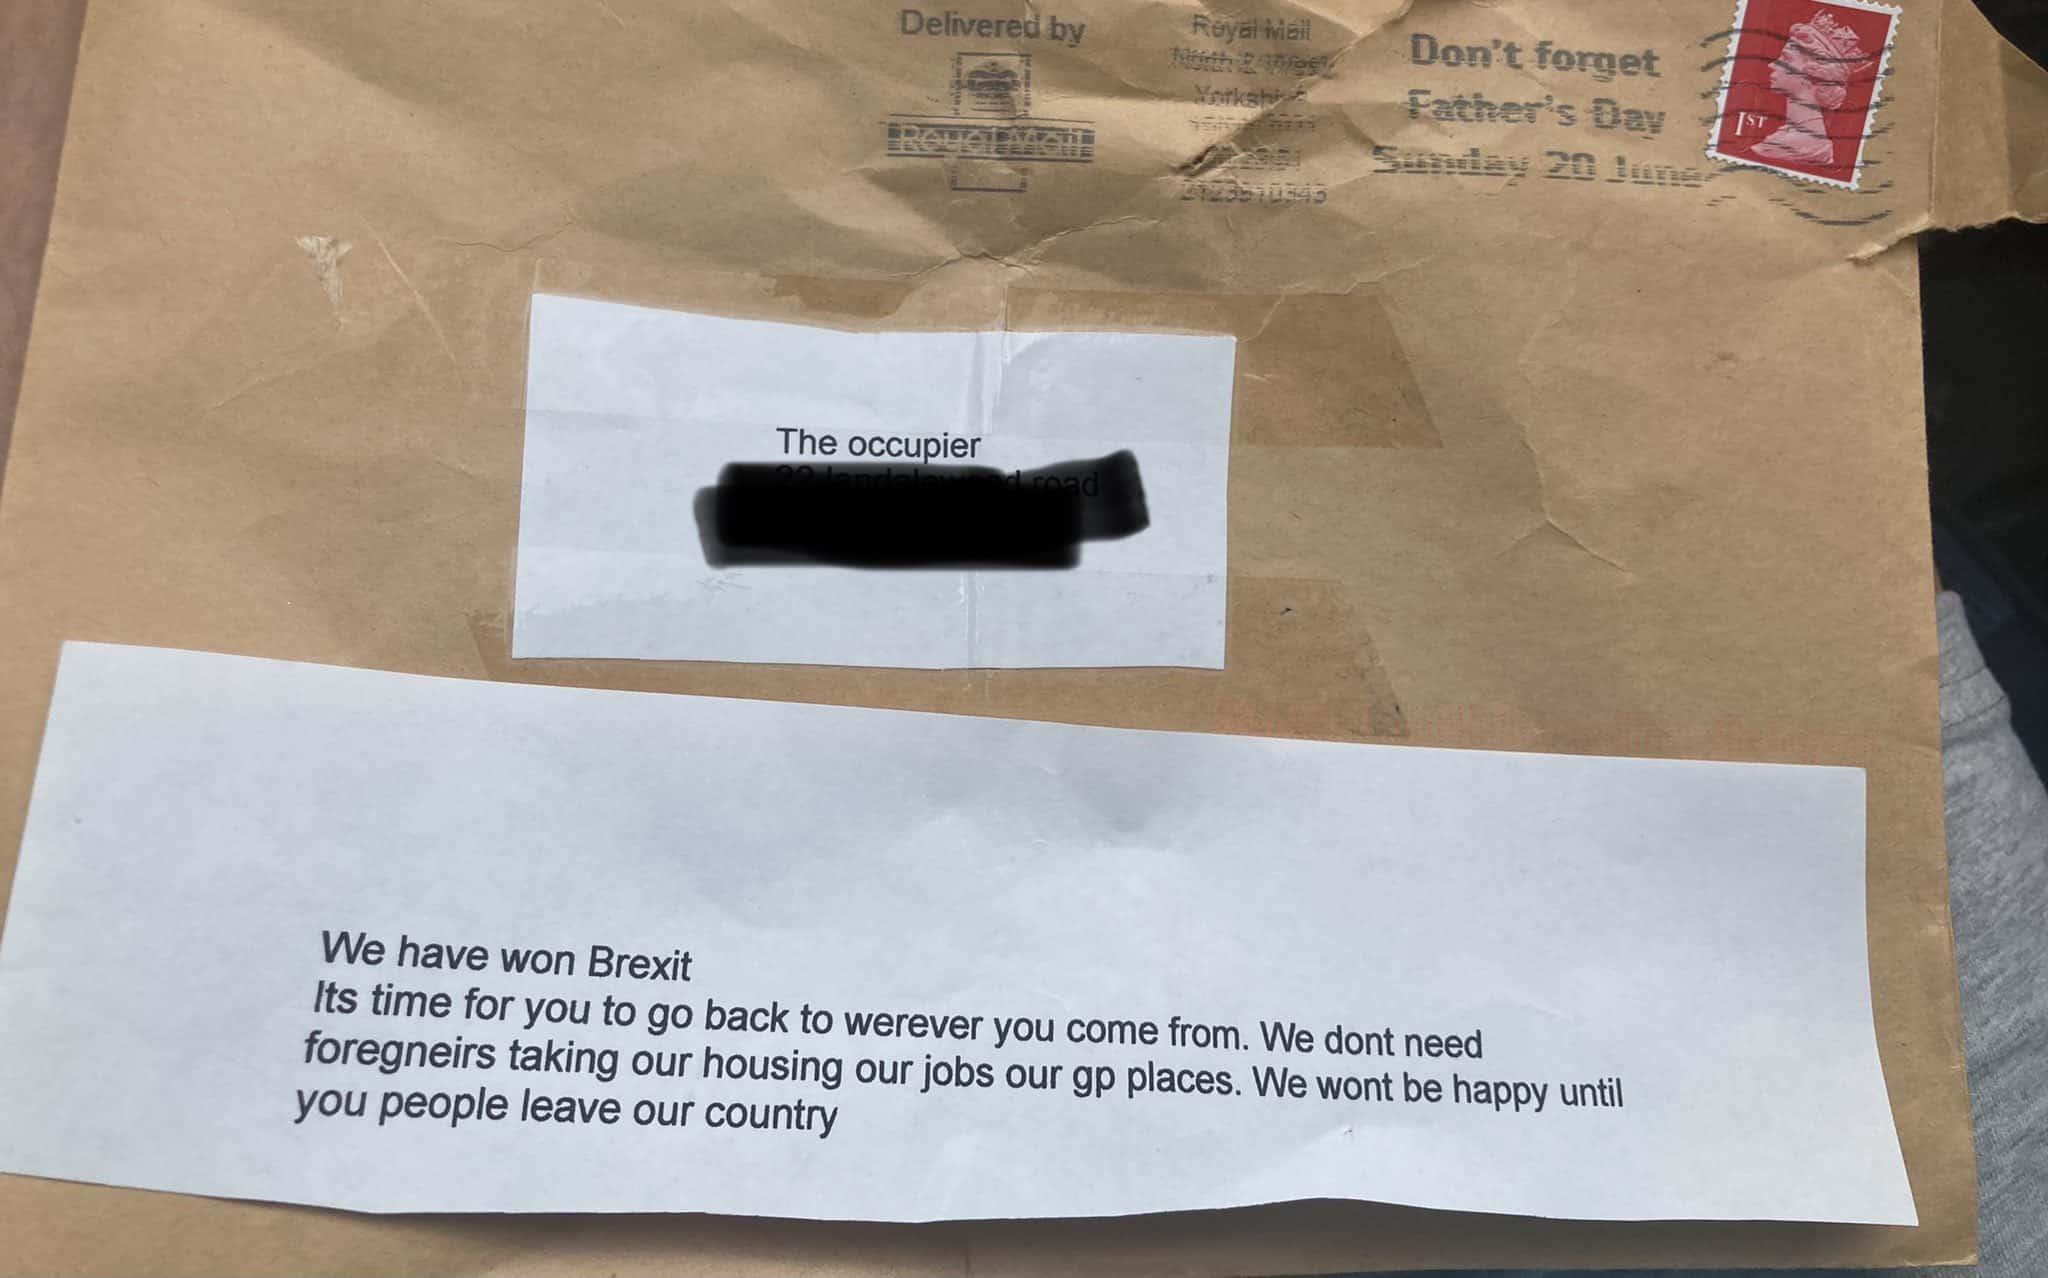 The letter Nicoletta Peddis received